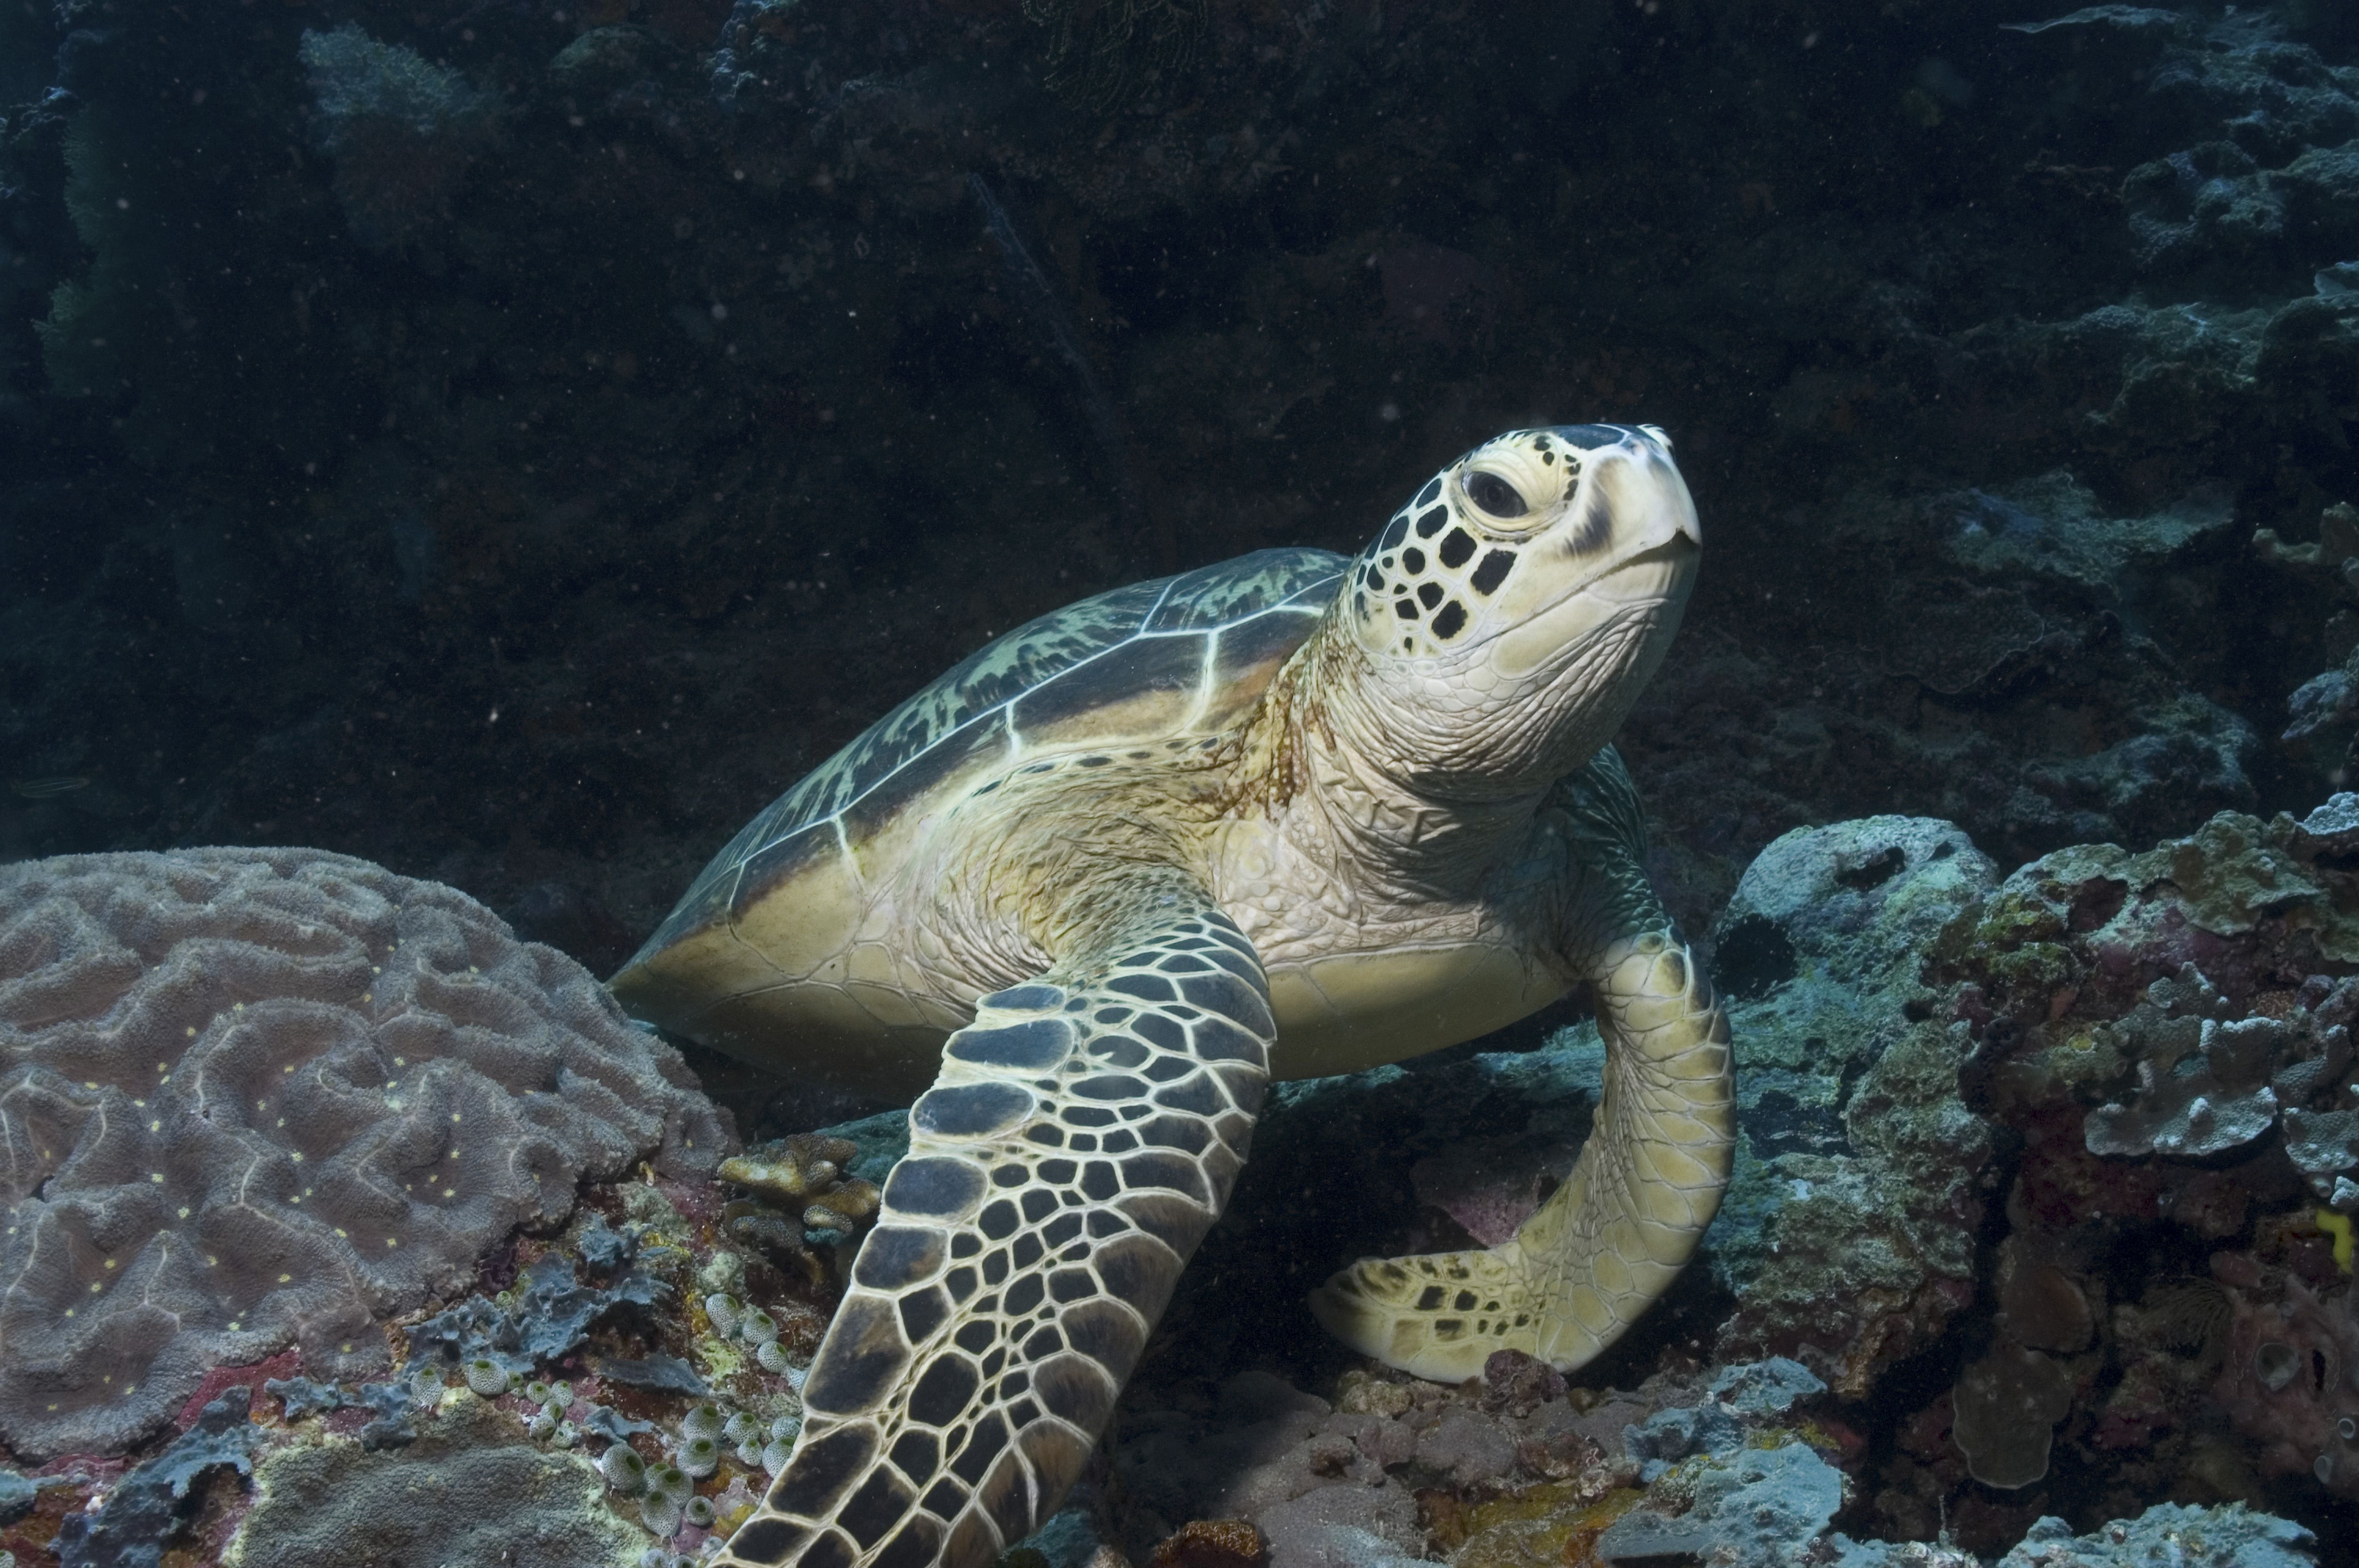 Green Turtle (Chelonia mydas), Turtle resting on top of good corals, Sipidan, Mabul, Malaysia.